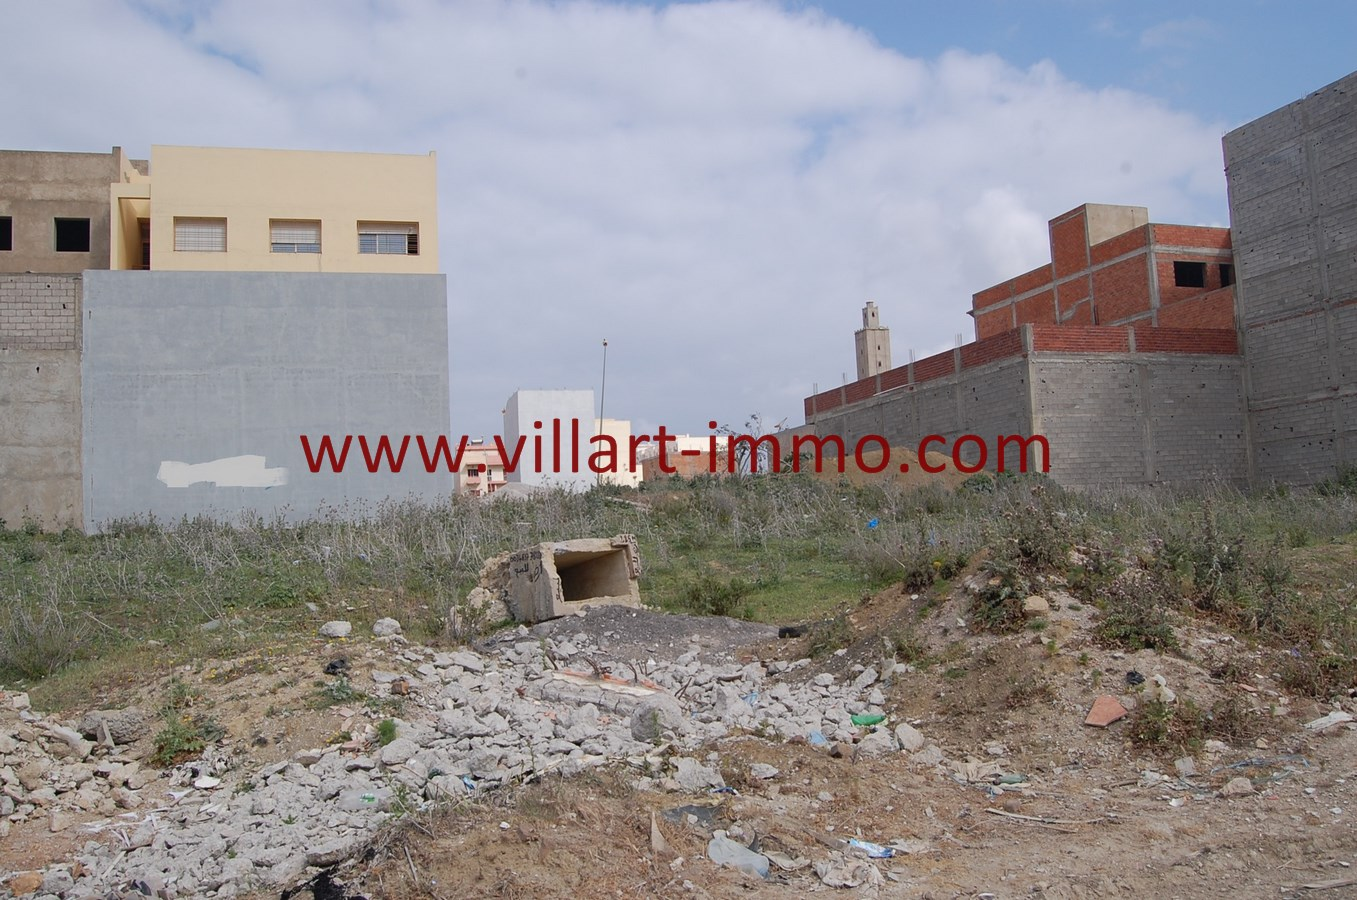 4-Vente-Terrain-Tanger-Gzenaya-VT27-Villart Immo